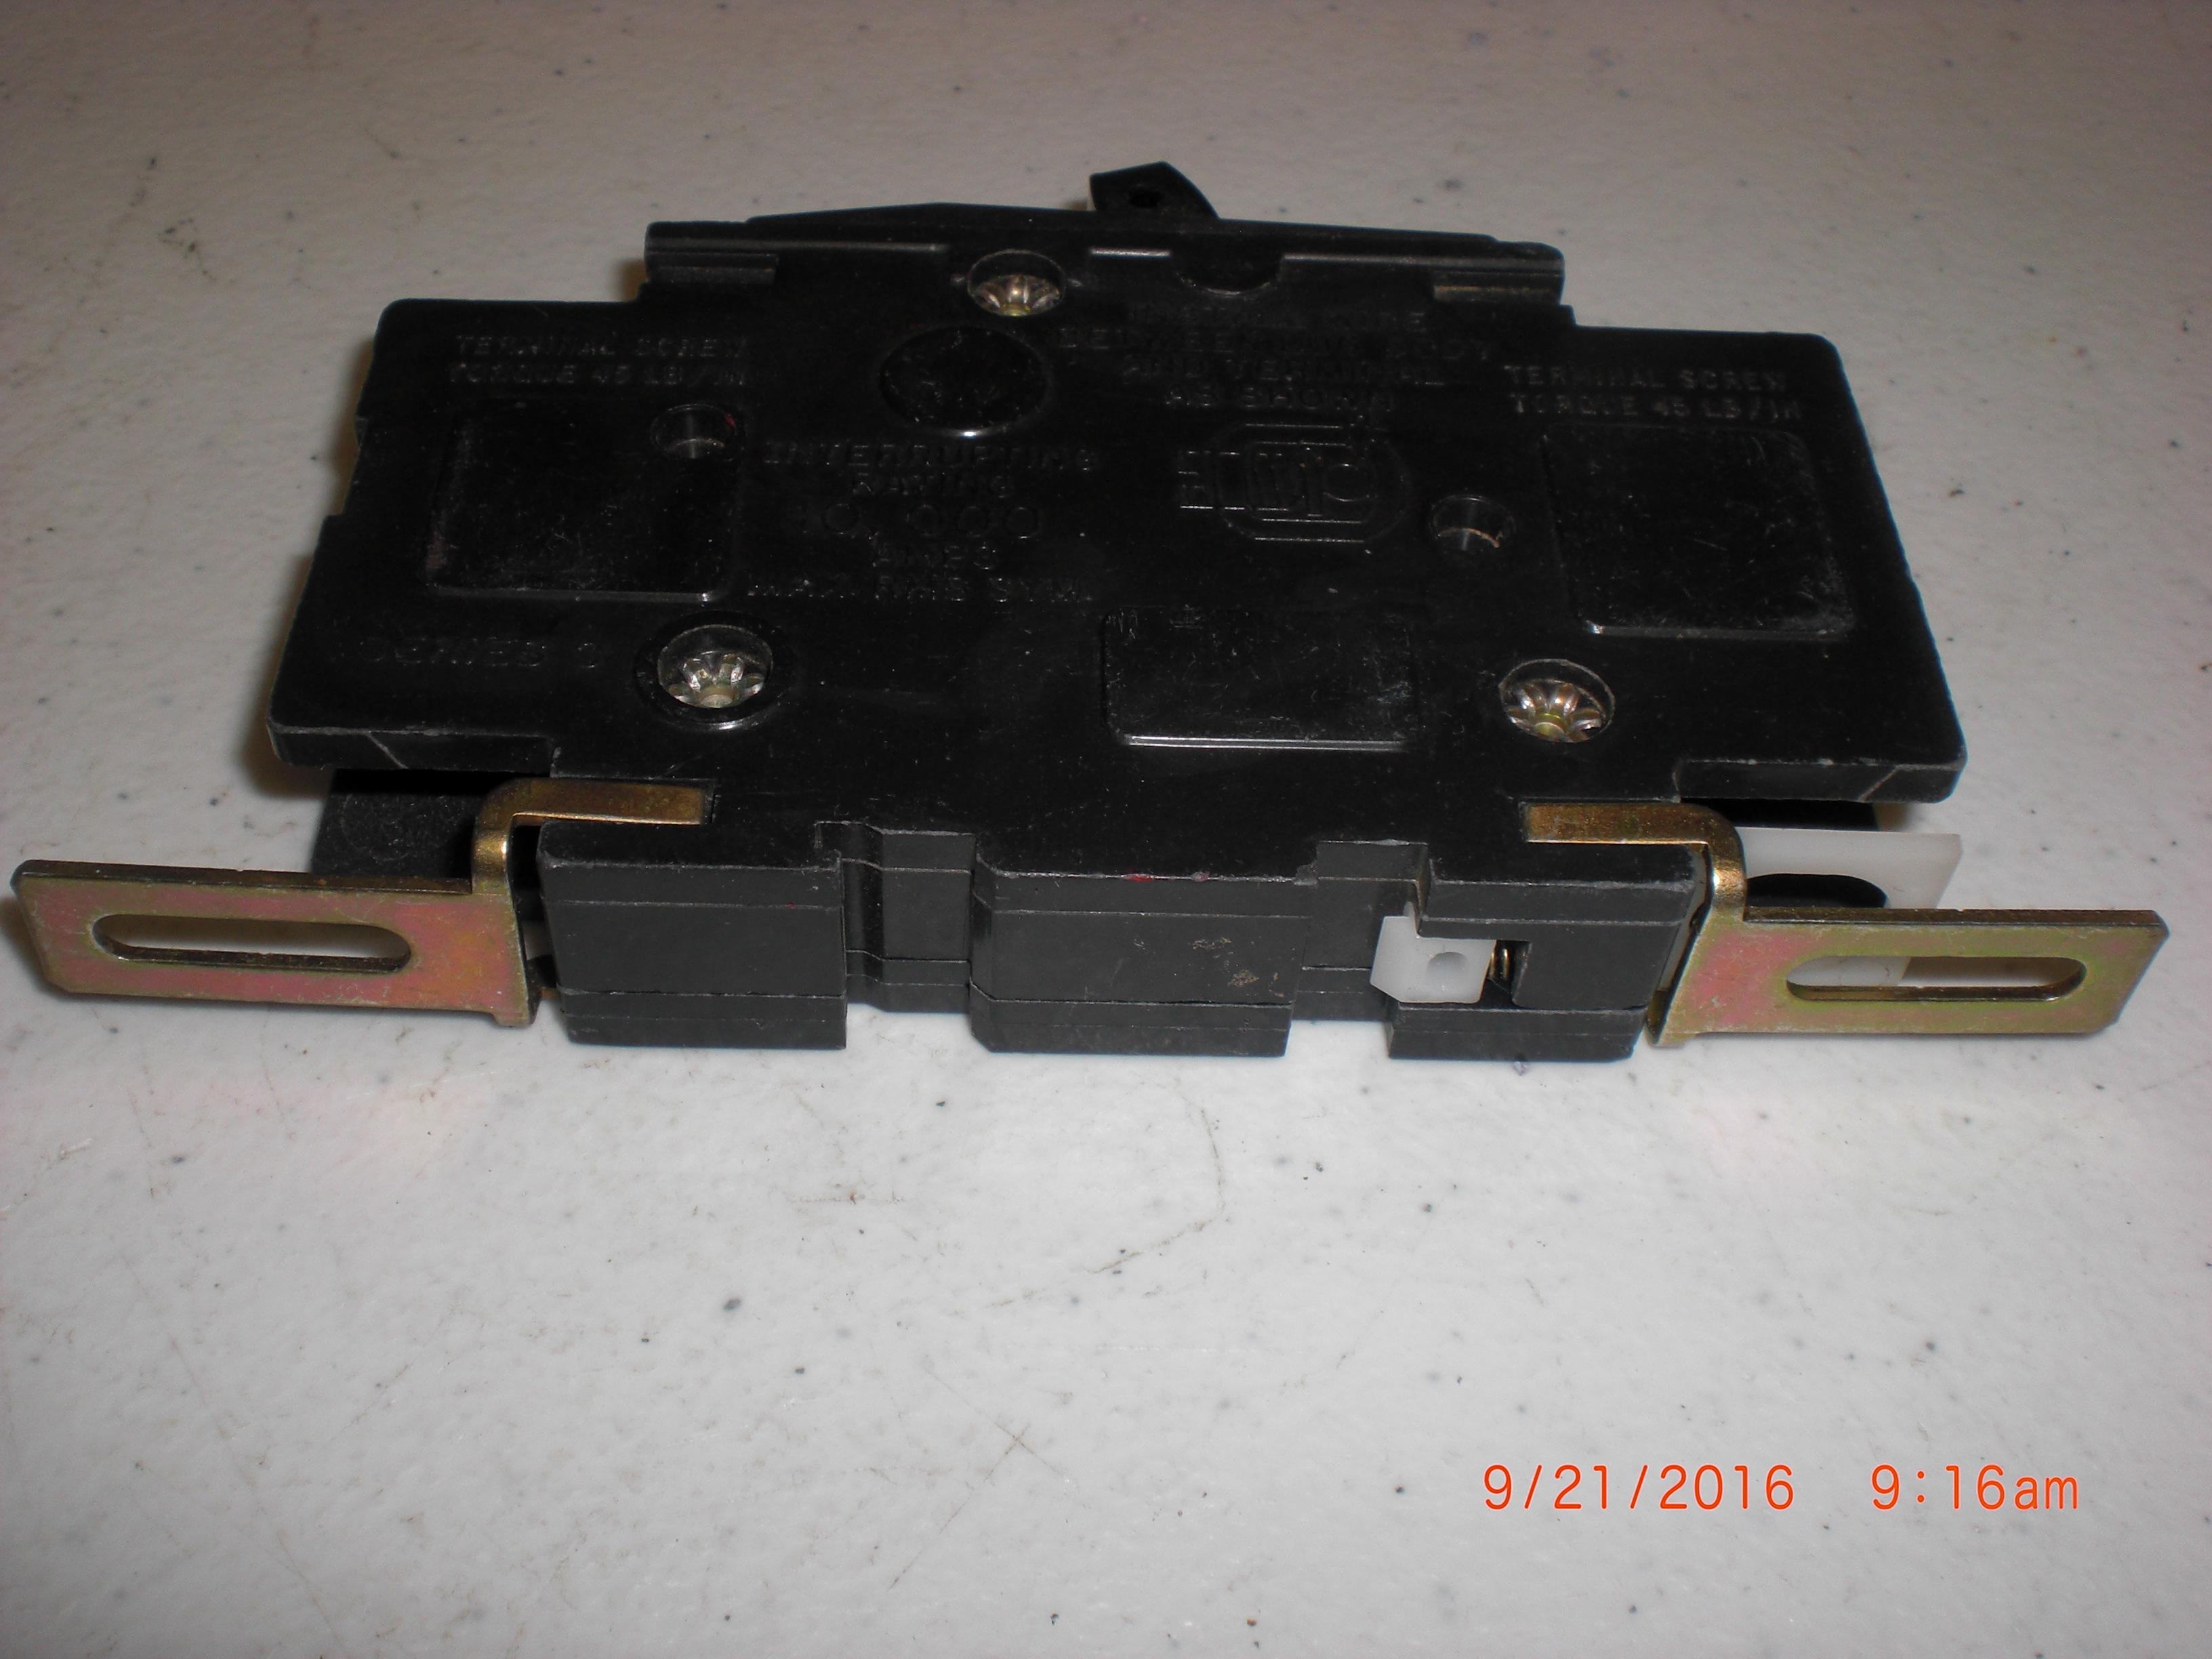 Square D Qo130gfi 1pole Gfci Circuit Breaker At Essenntialhardware